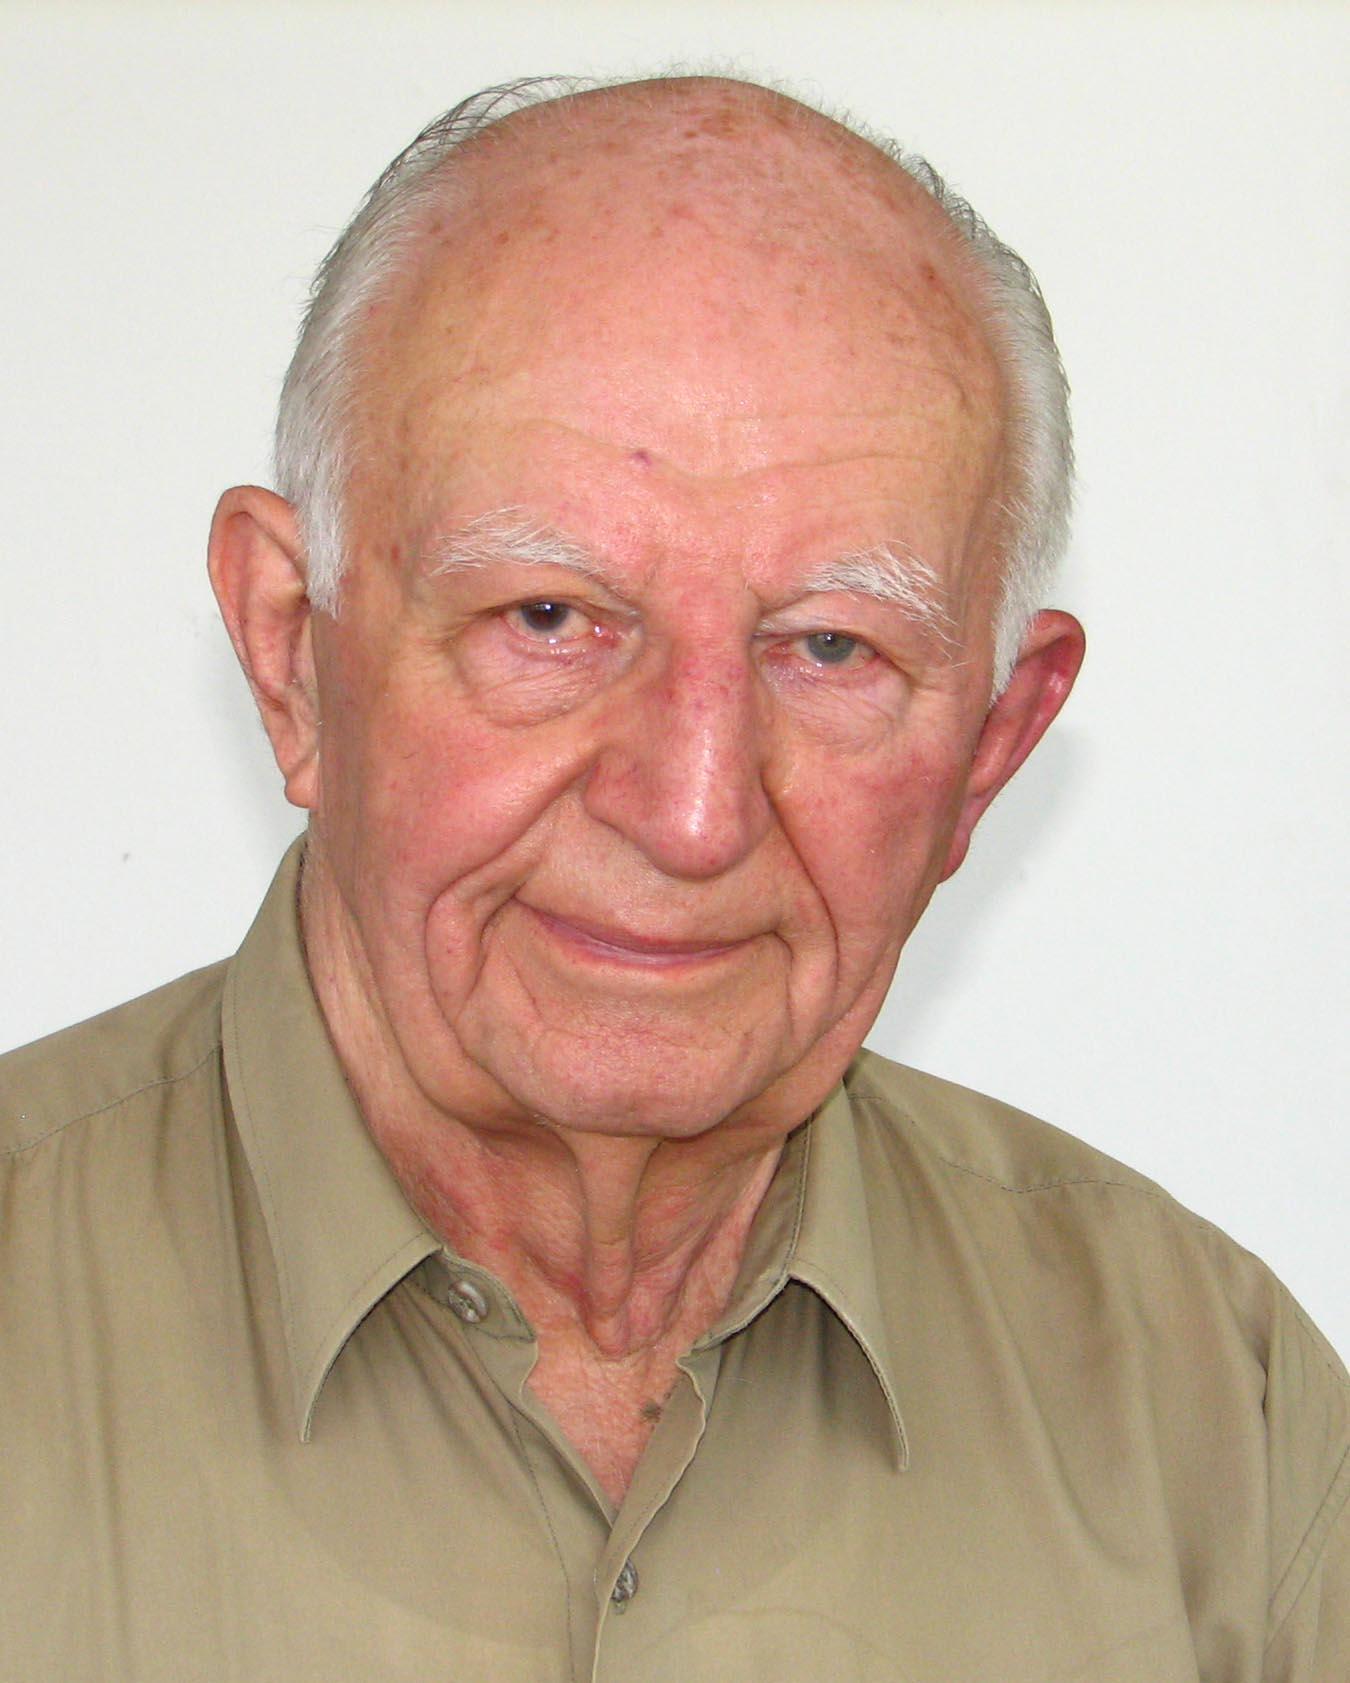 Kassai Tibor